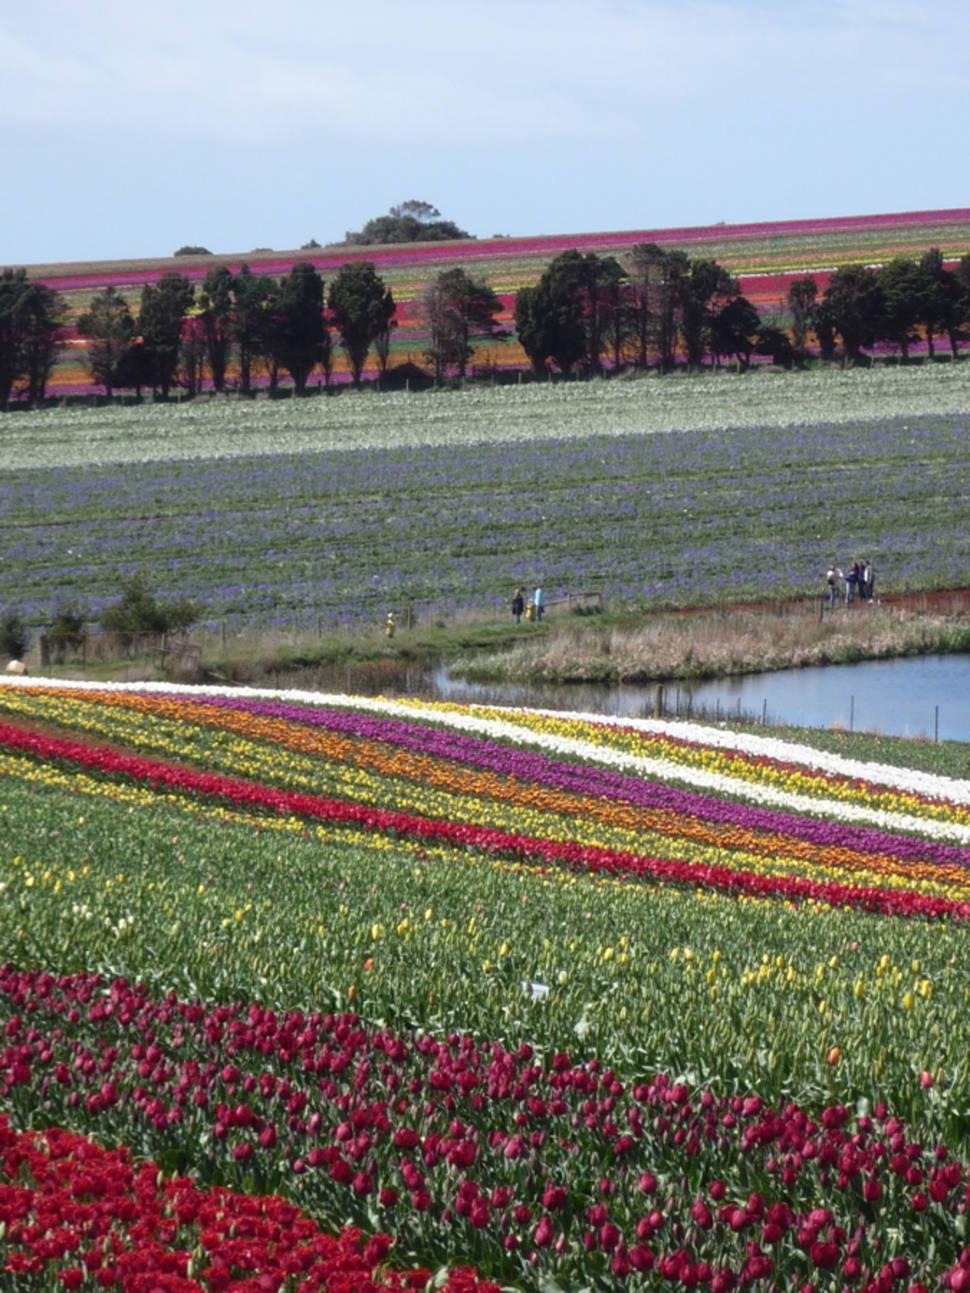 Best time to see Blooming Tulips in Tasmania